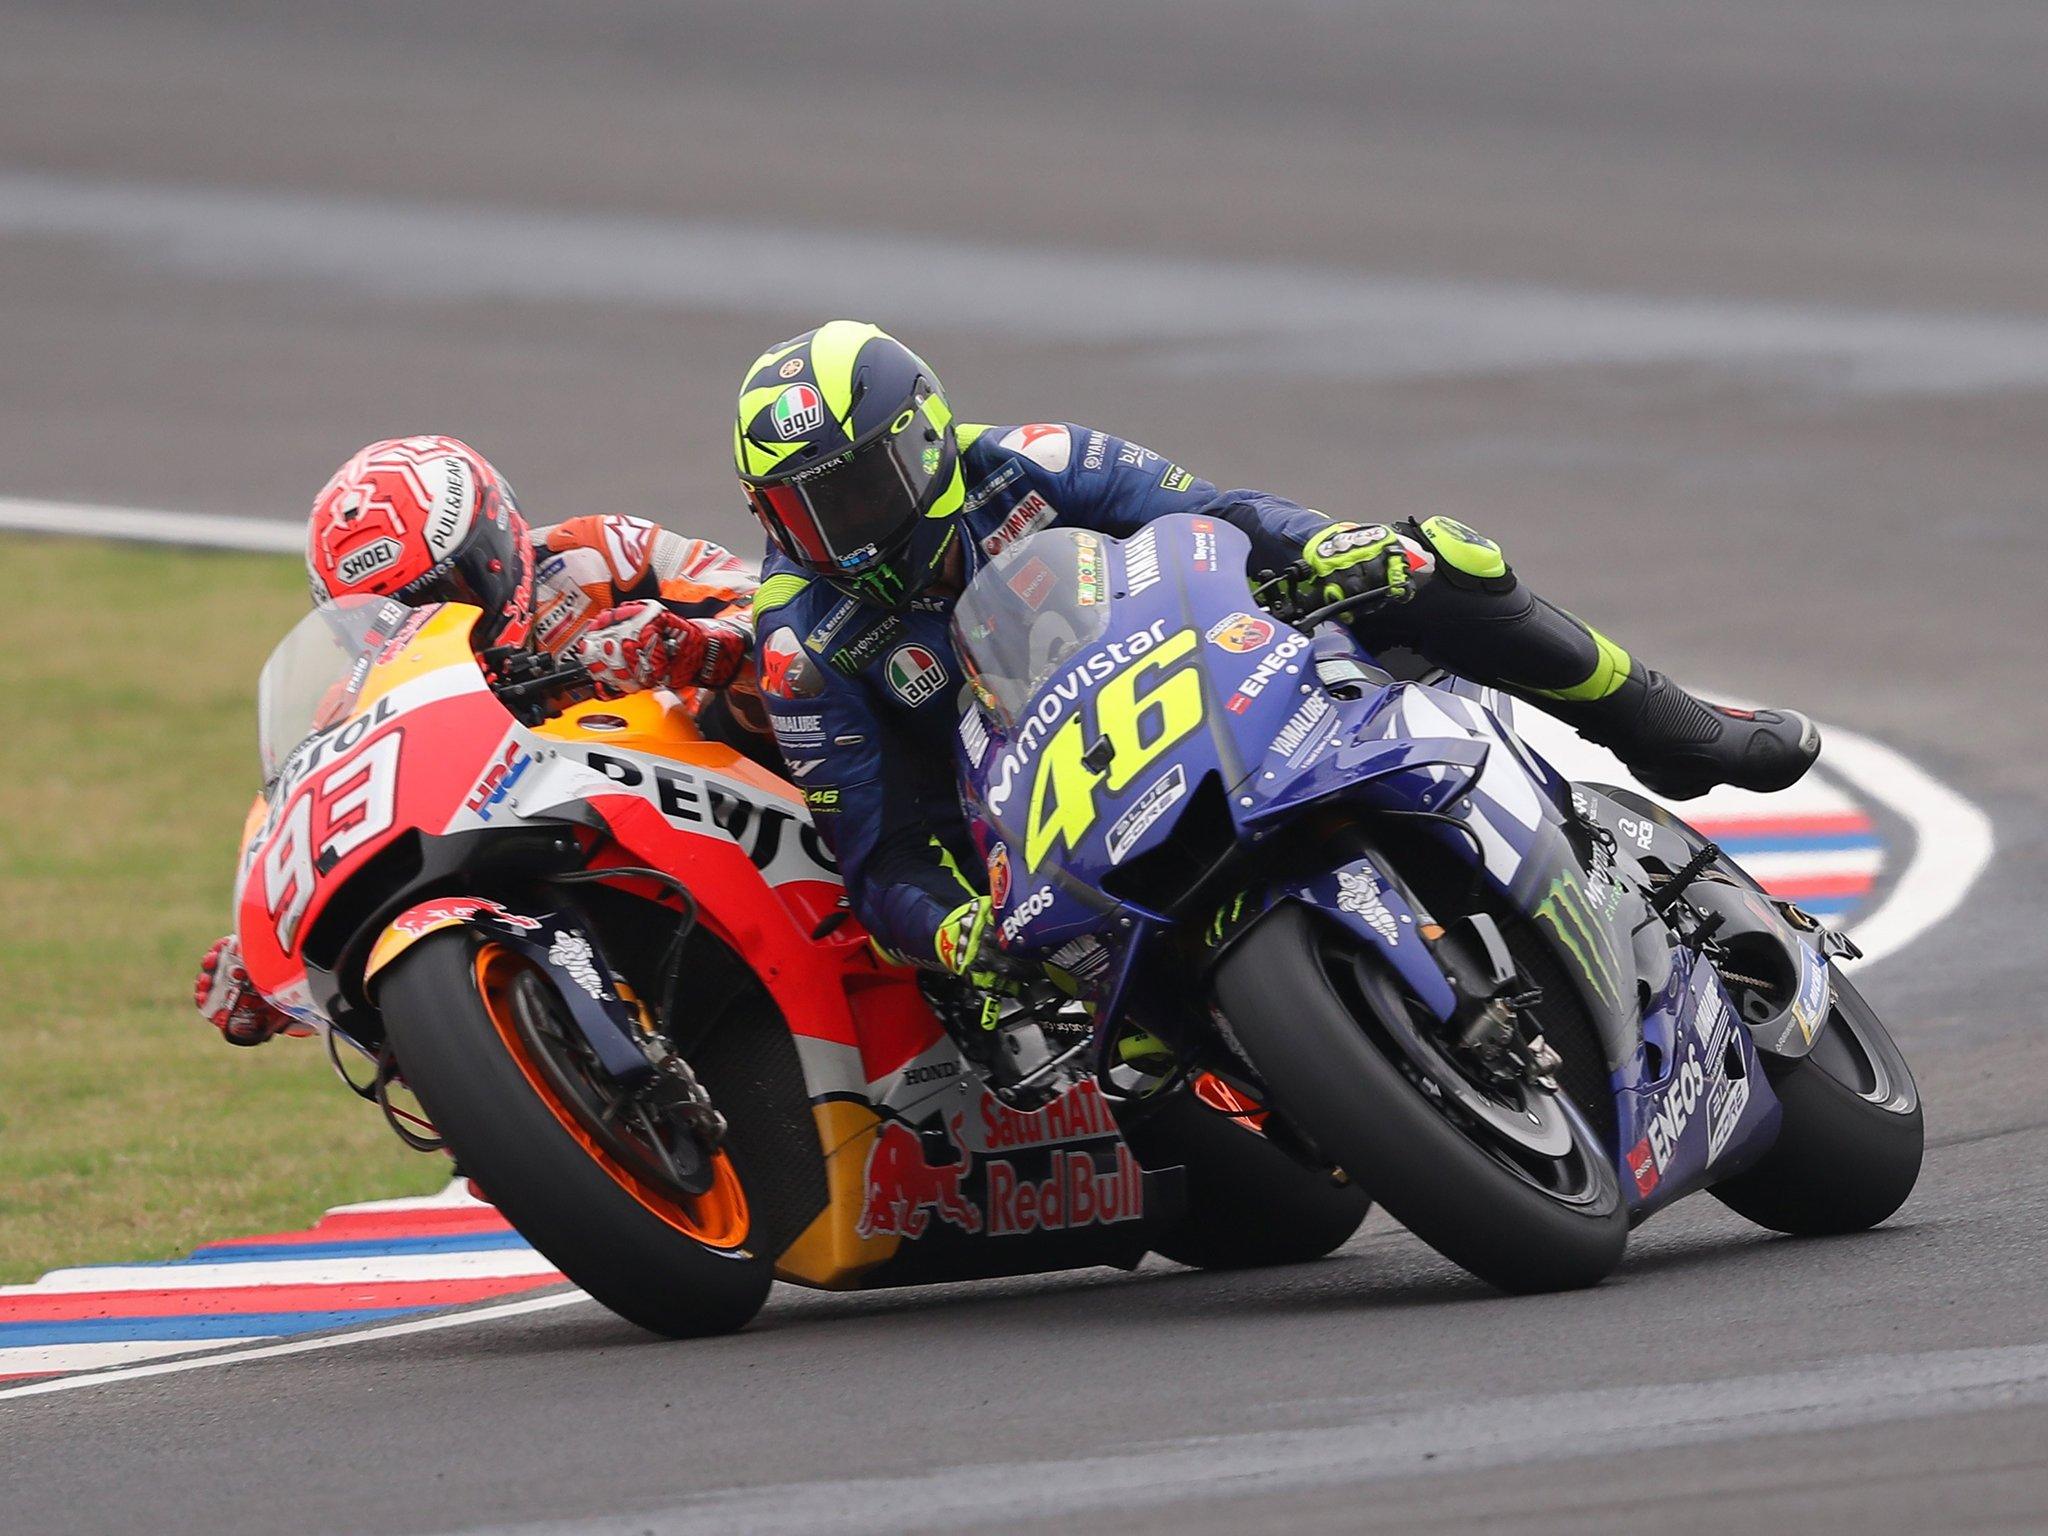 racing rossi marquez motorcycle part vs ten rivalries fiercest moto gp famous